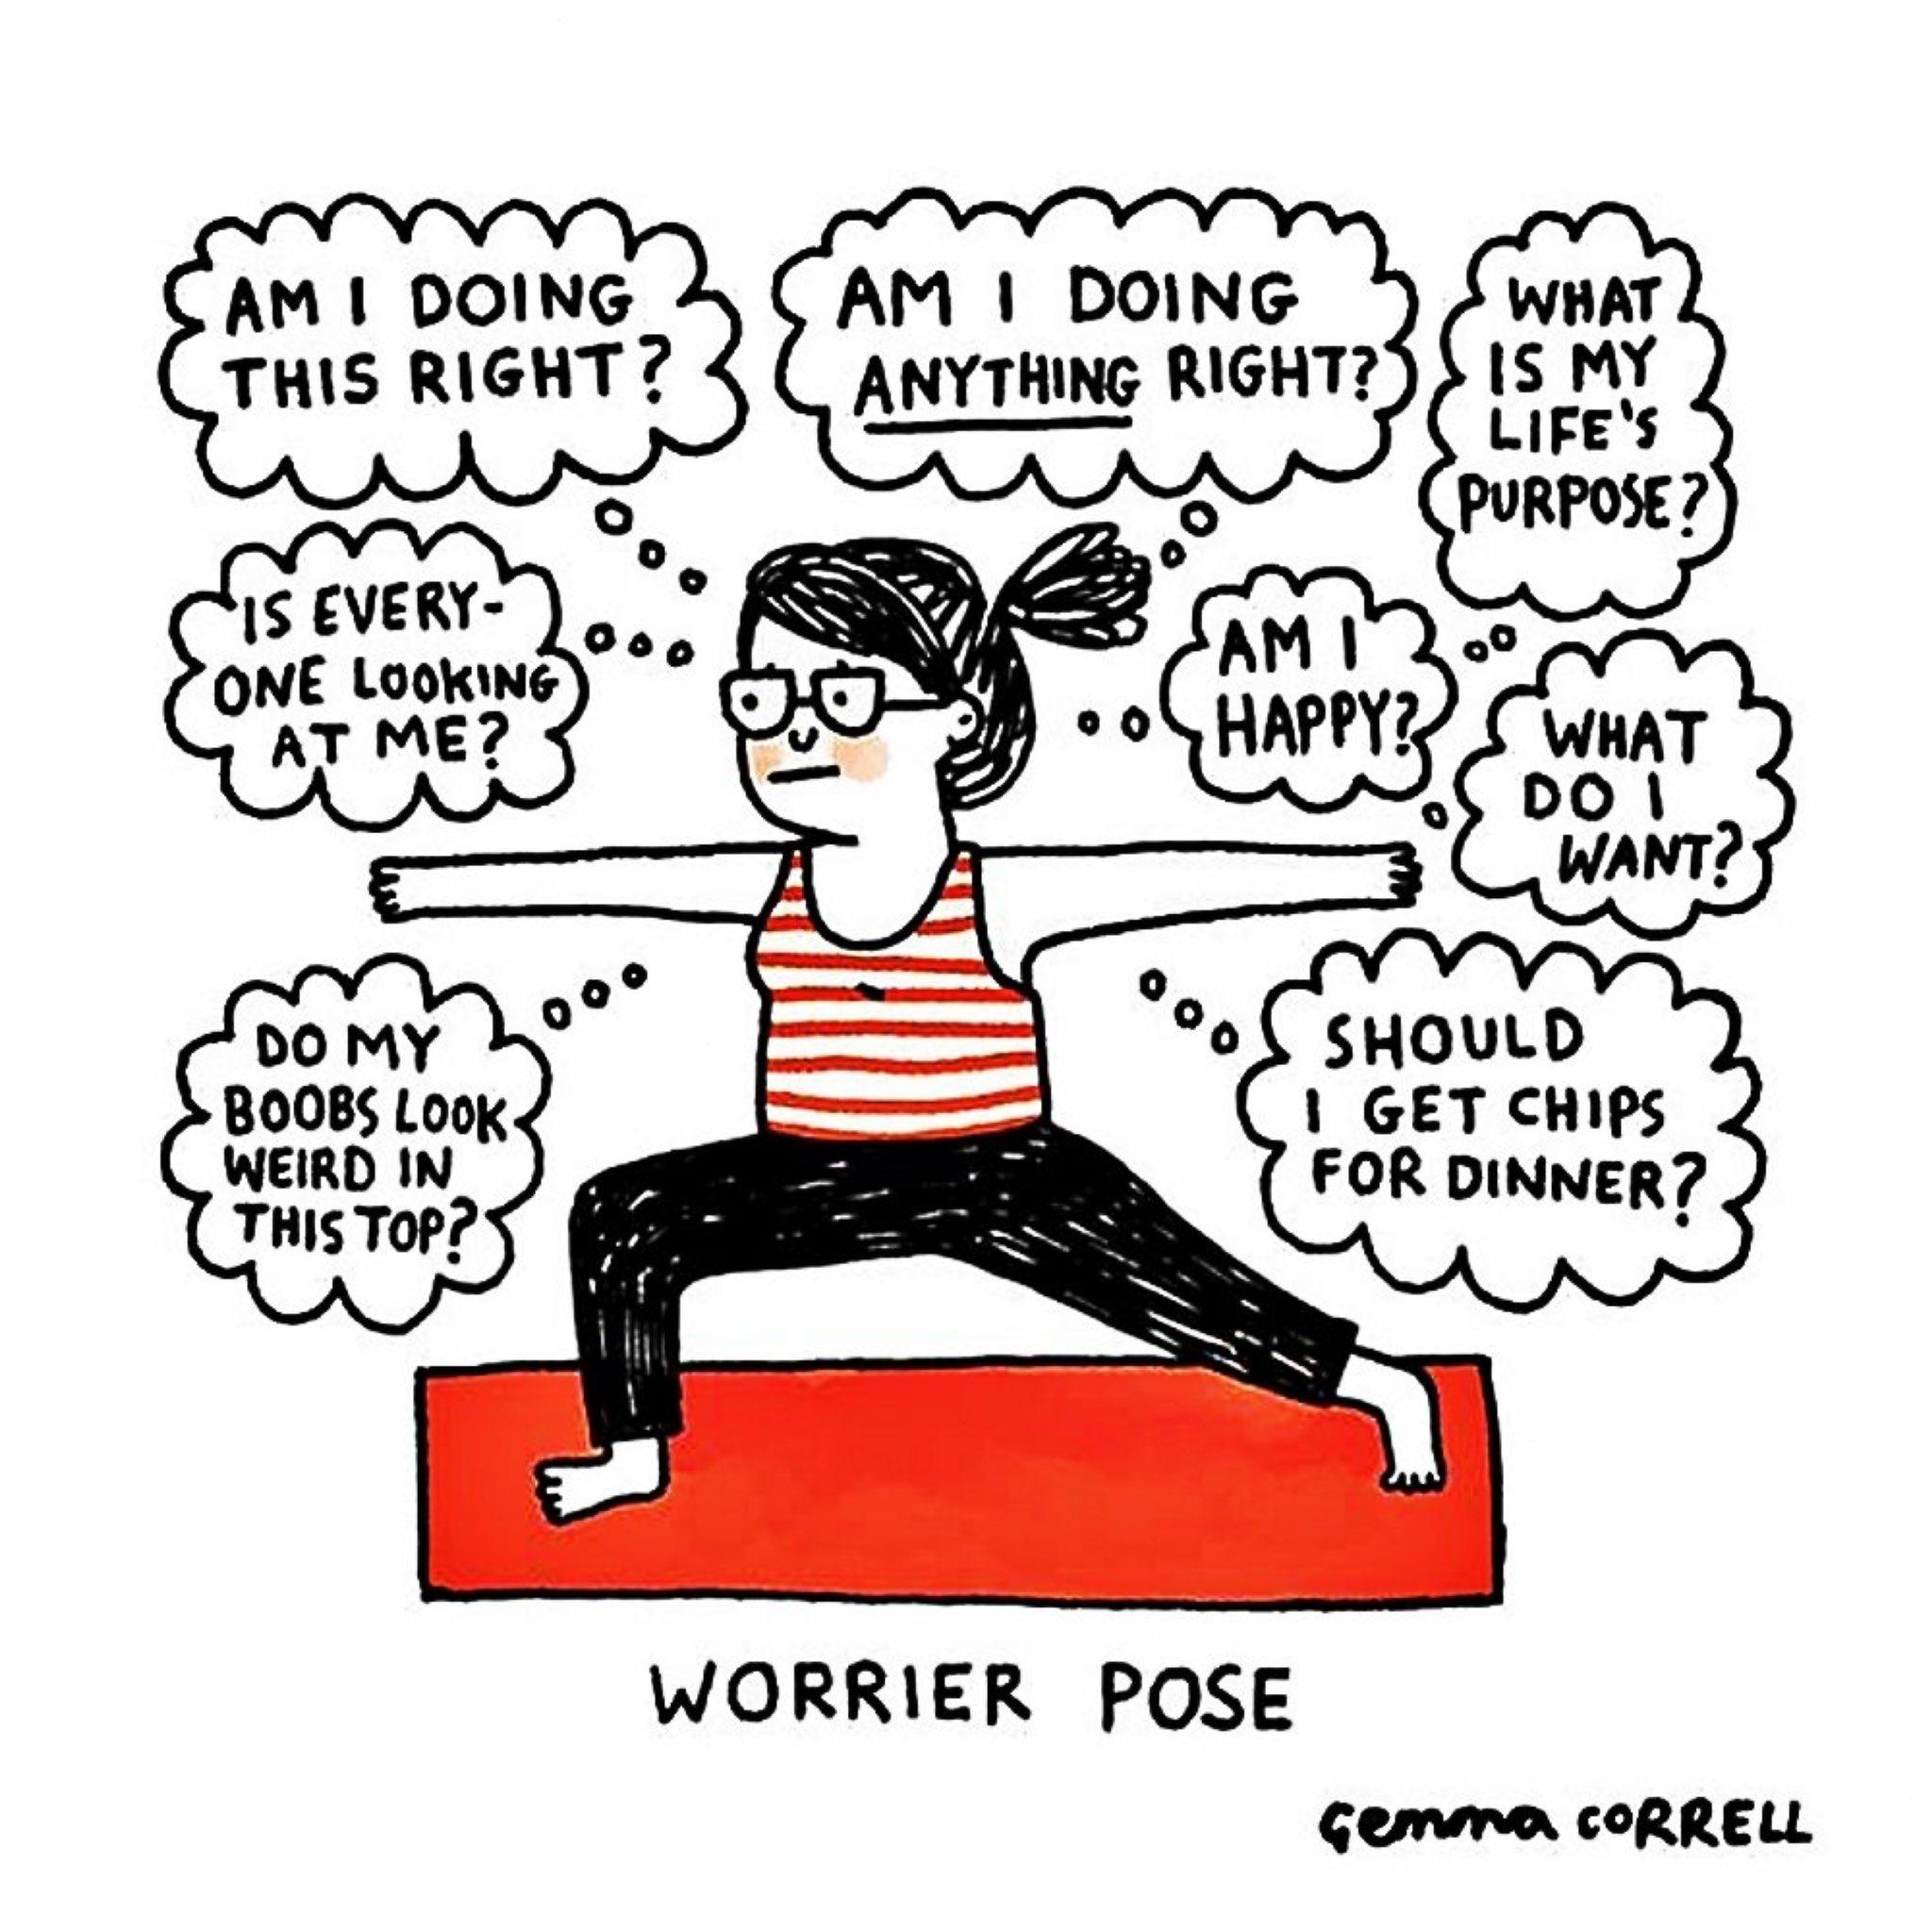 Worrier pose 75% of the time 😅  👩🏽🎨: @gemmacorrell https://t.co/7nxvNK6Zhn